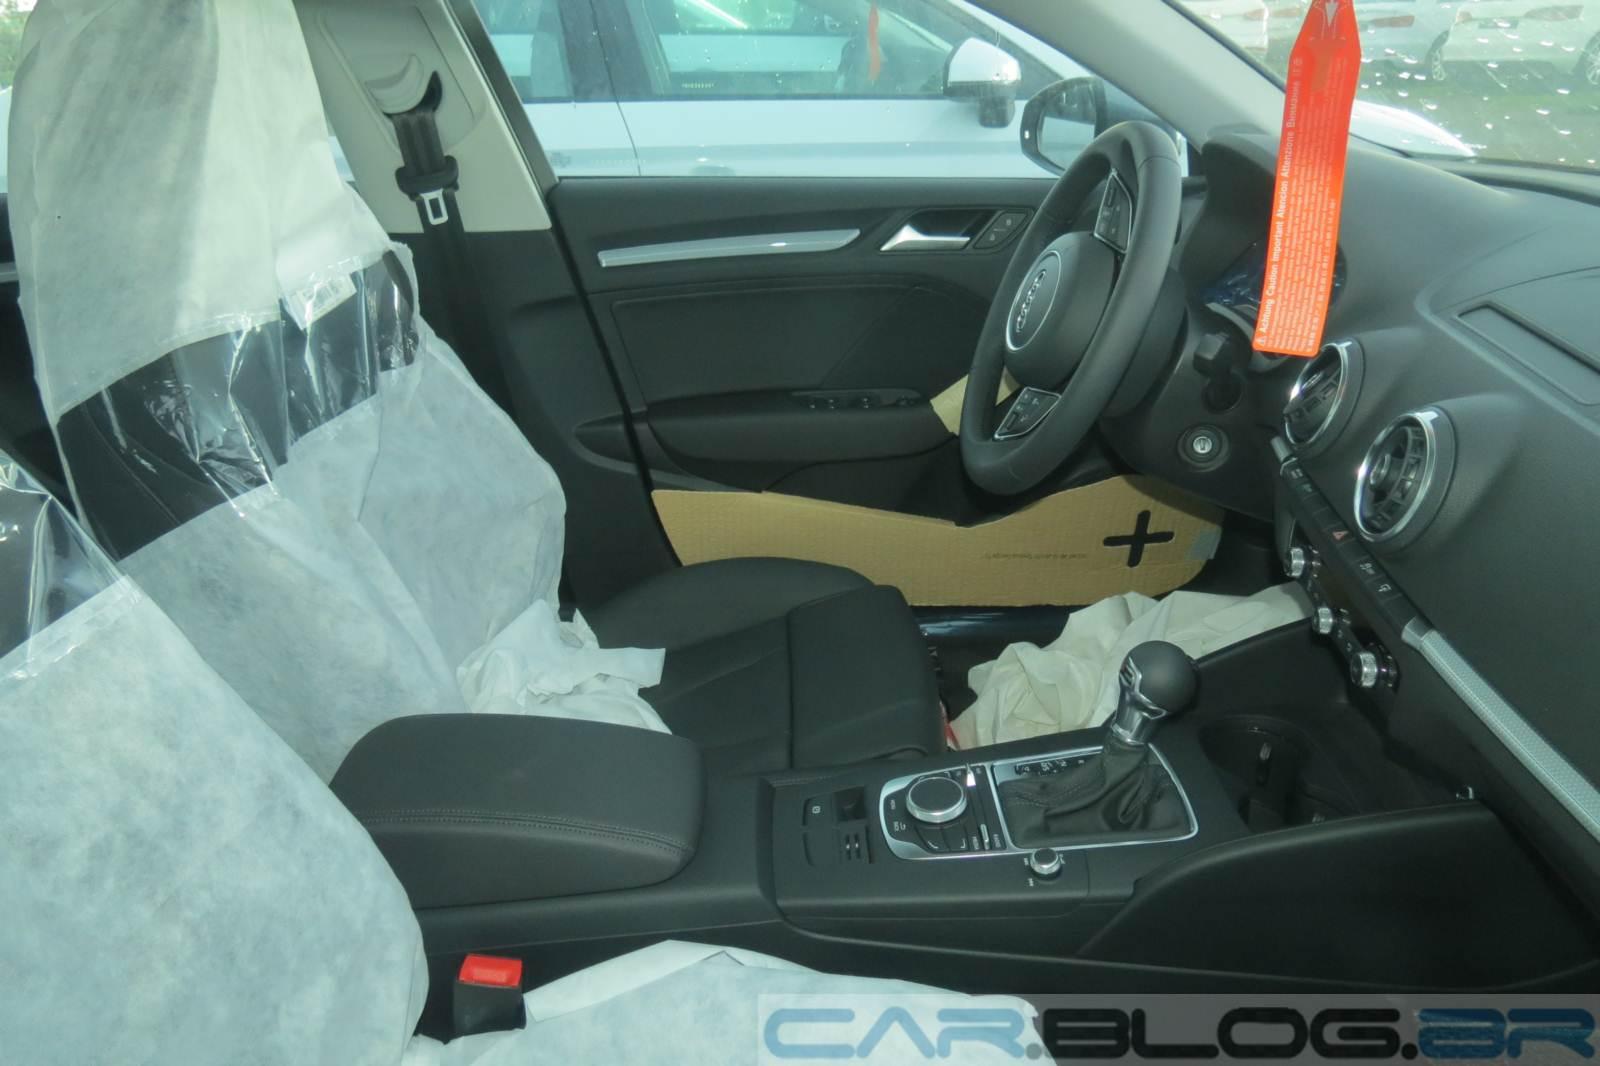 Audi A3 Sedan 1.8 TSFI Ambition - interior